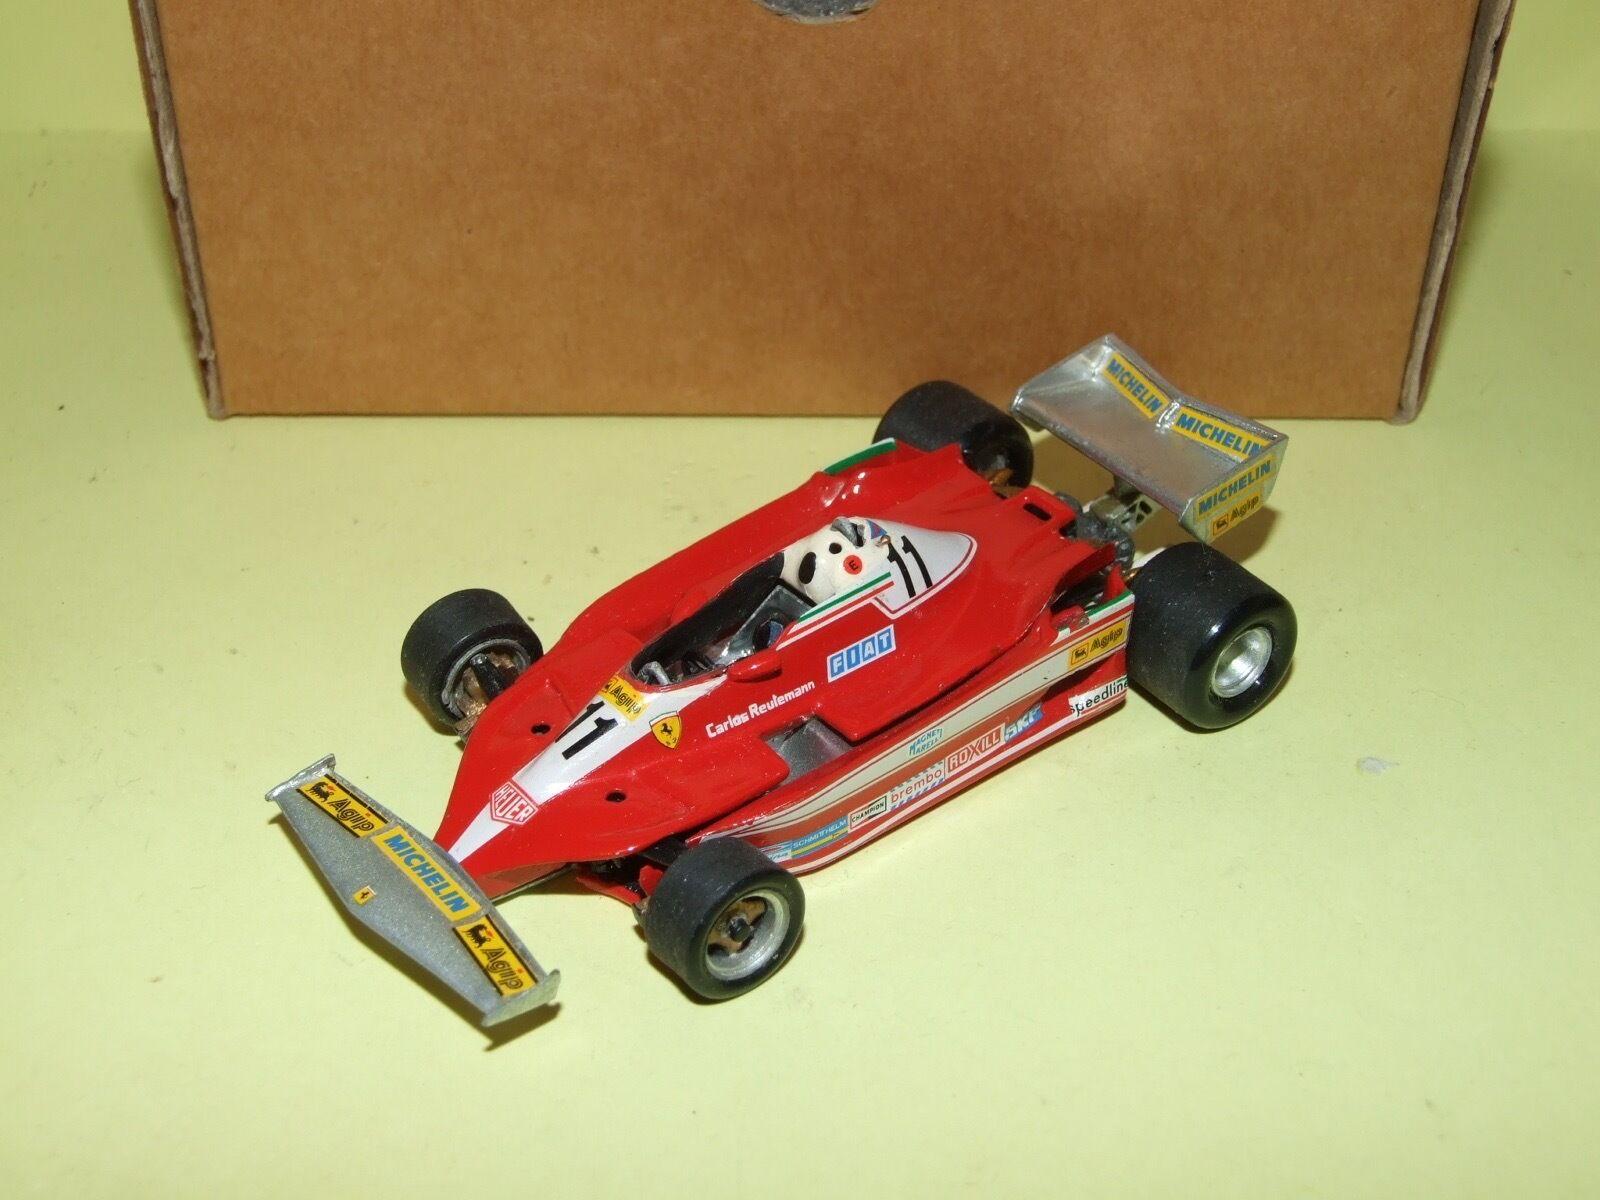 Ferrari 312 t3 long beach 1979 reutemann meri kit 1 43 arrival 3è championship